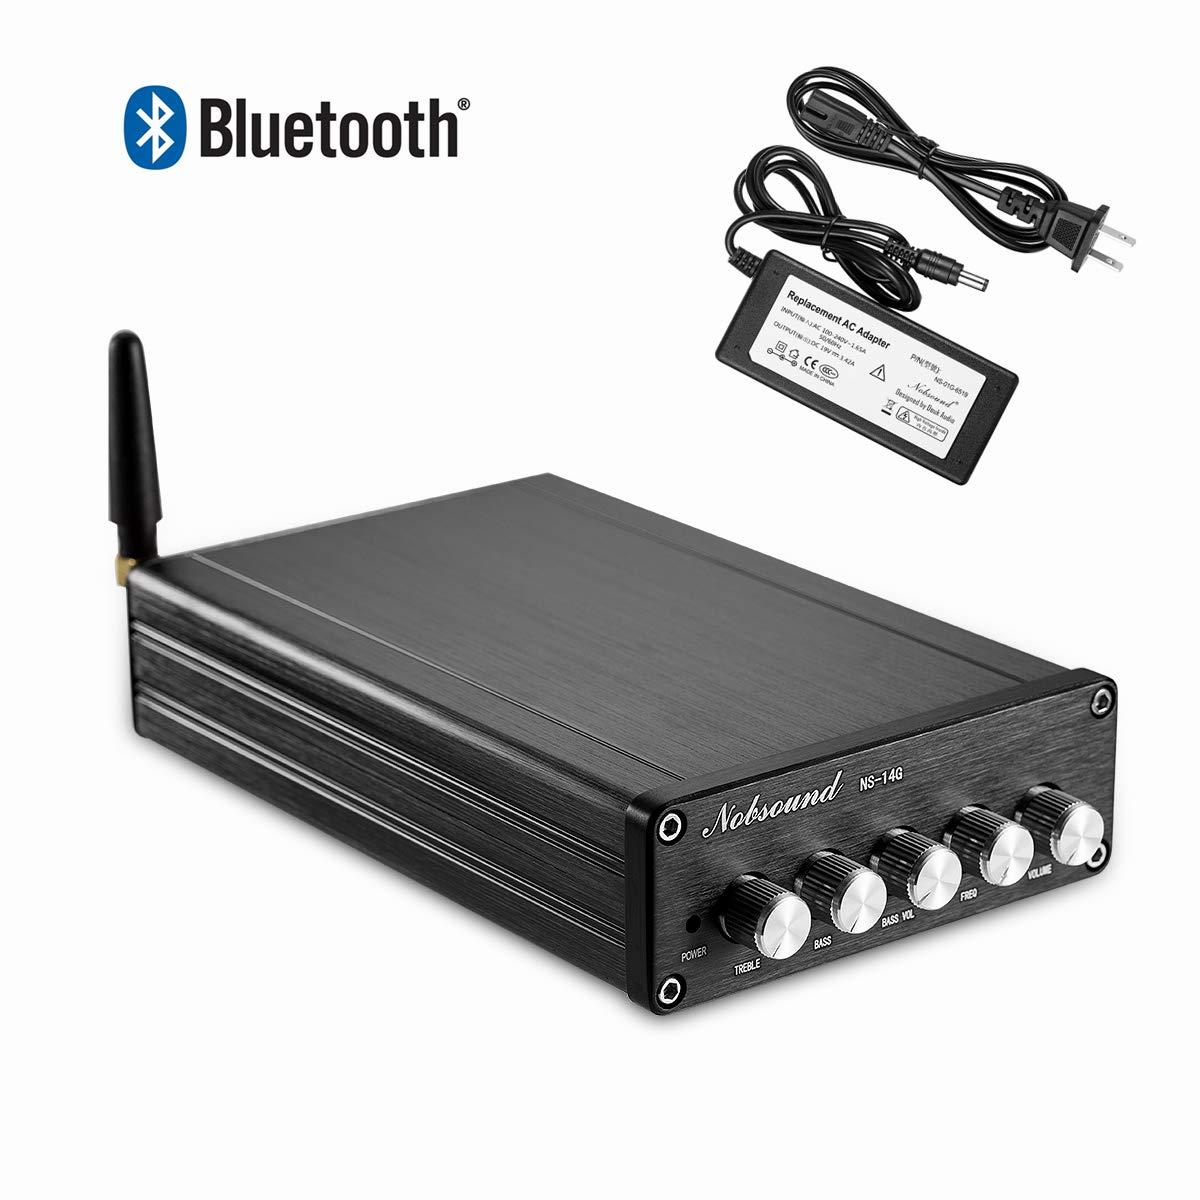 Nobsound 2.1 Channel Bluetooth 4.2 Amplifier , Class D Stereo Audio Amplifier , Mini Home Theater Power Amp , Digital Power Subwoofer Amplifier Receiver , 100W+50Wx2, Treble & Bass Control (NS-14G)